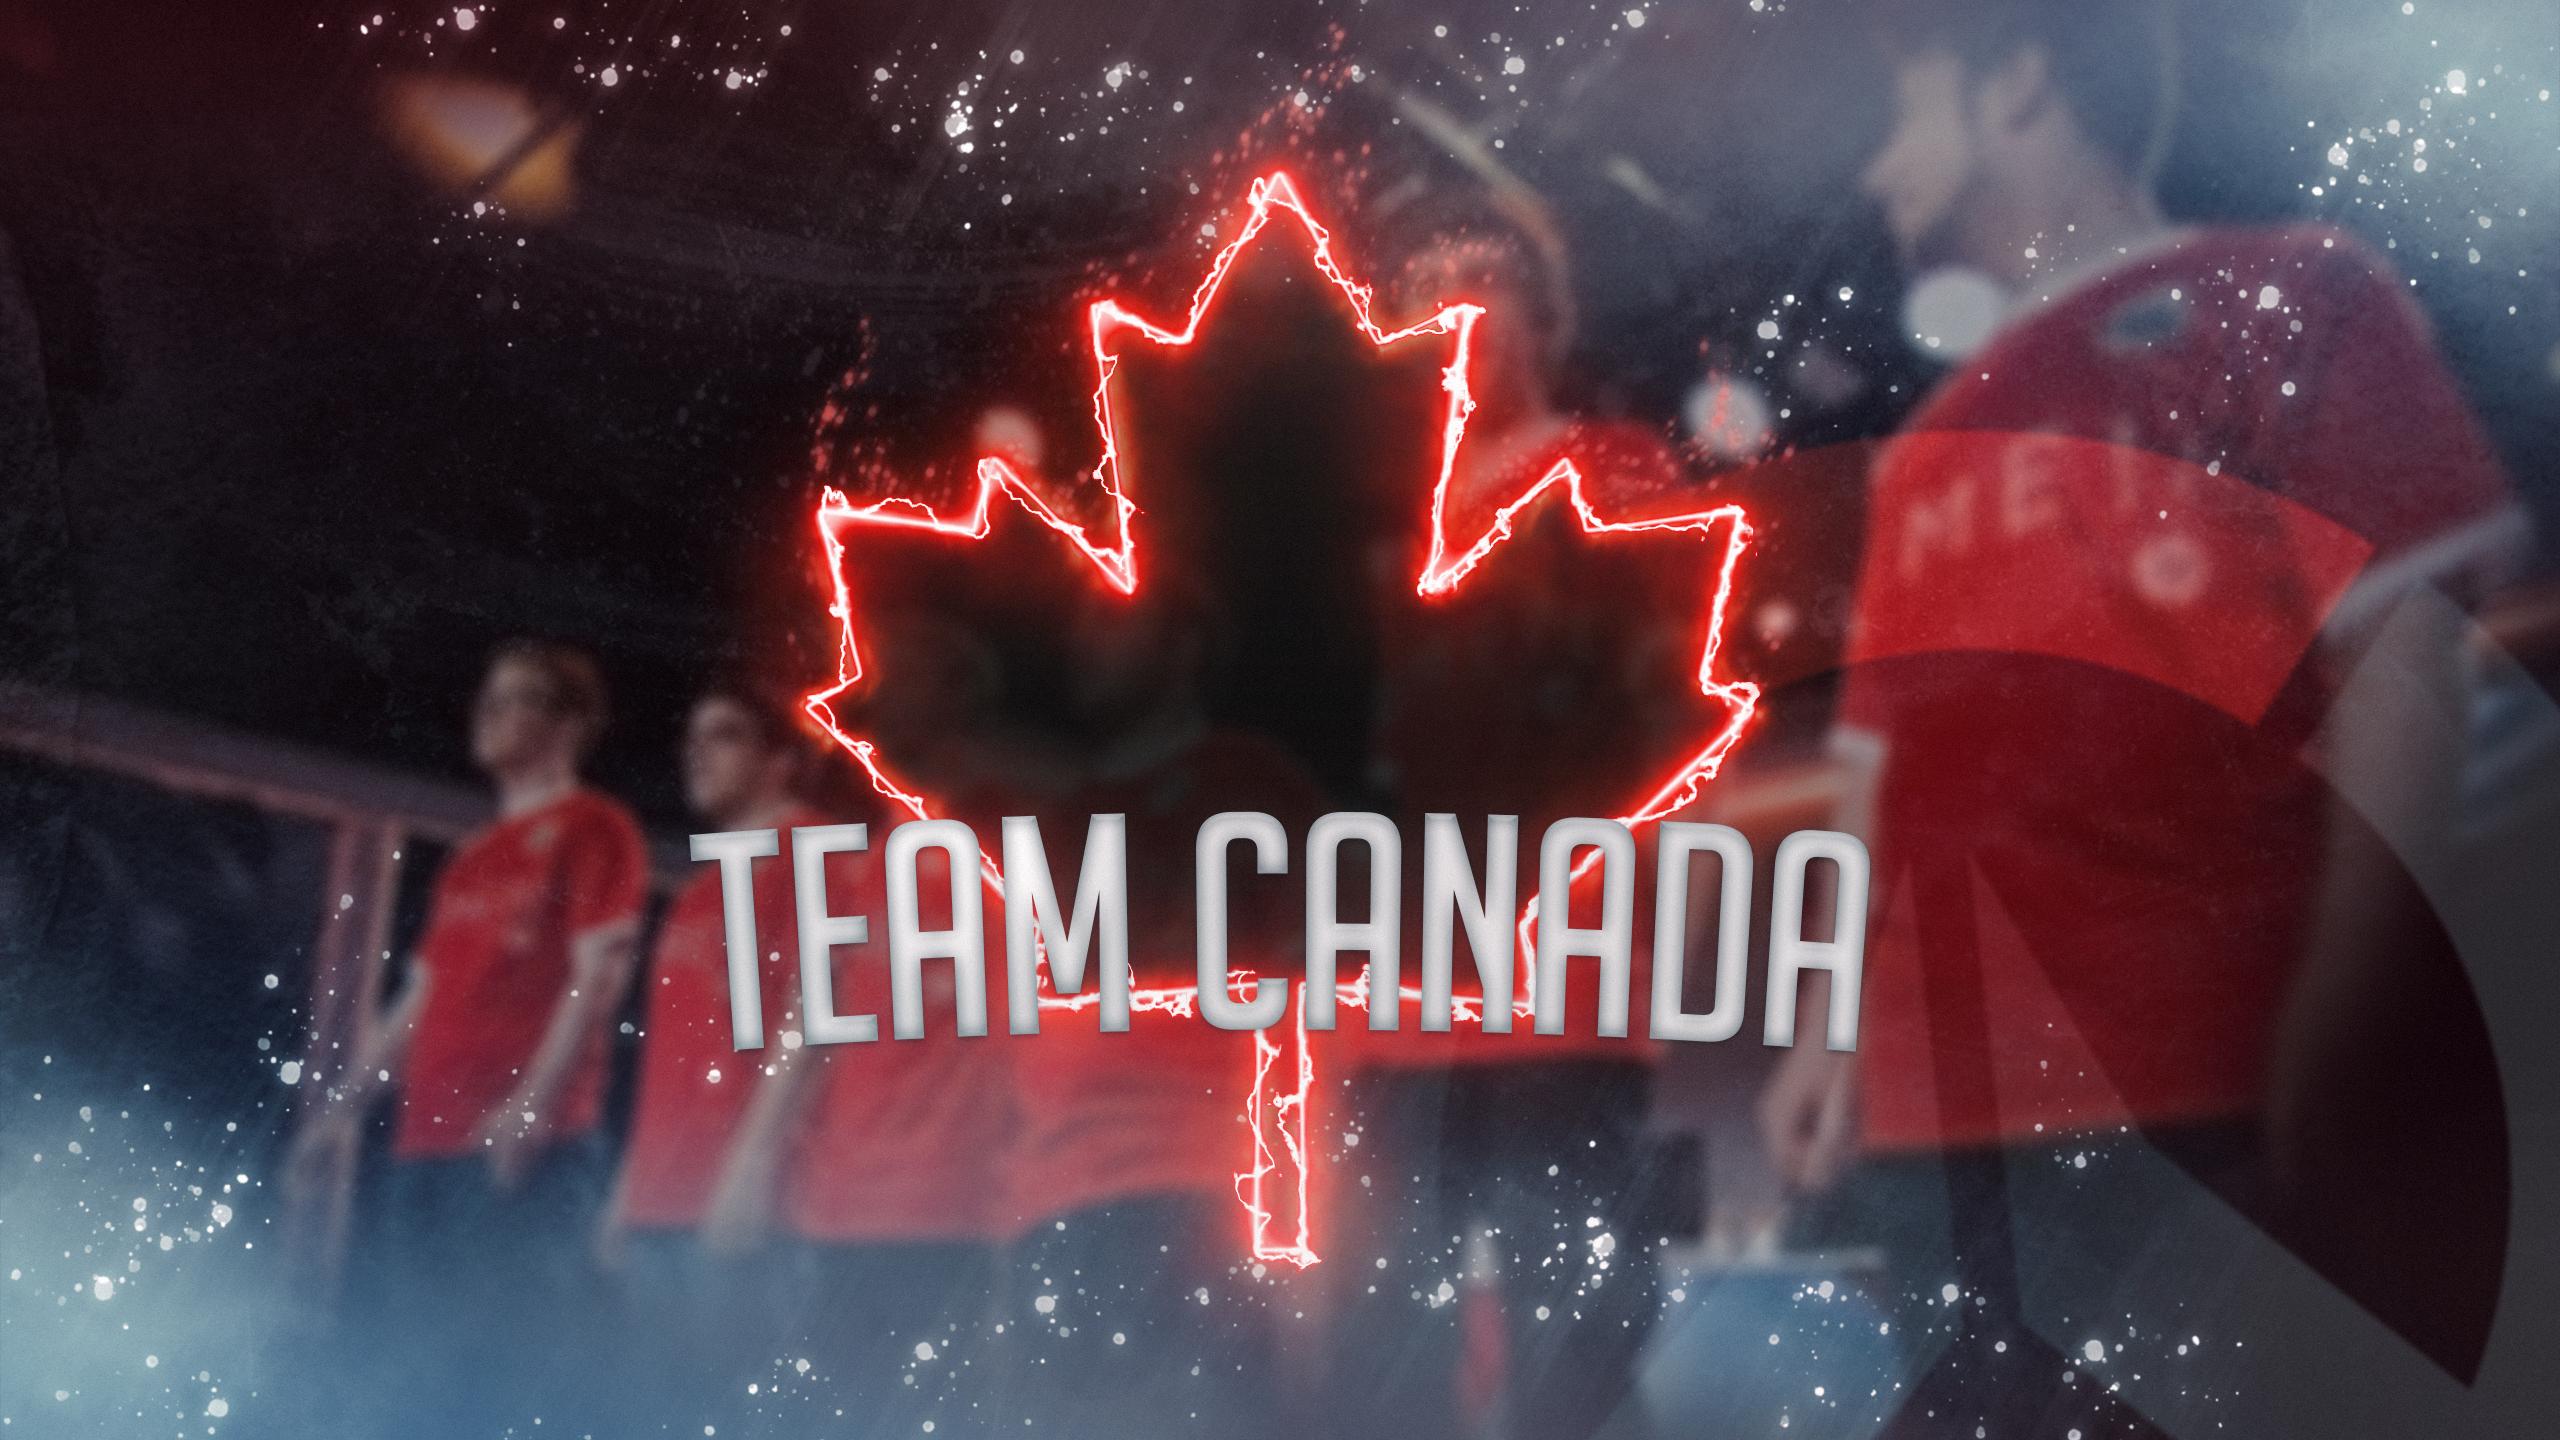 Wallpaper : Overwatch, Team Canada, OWWC, Esport 2560x1440